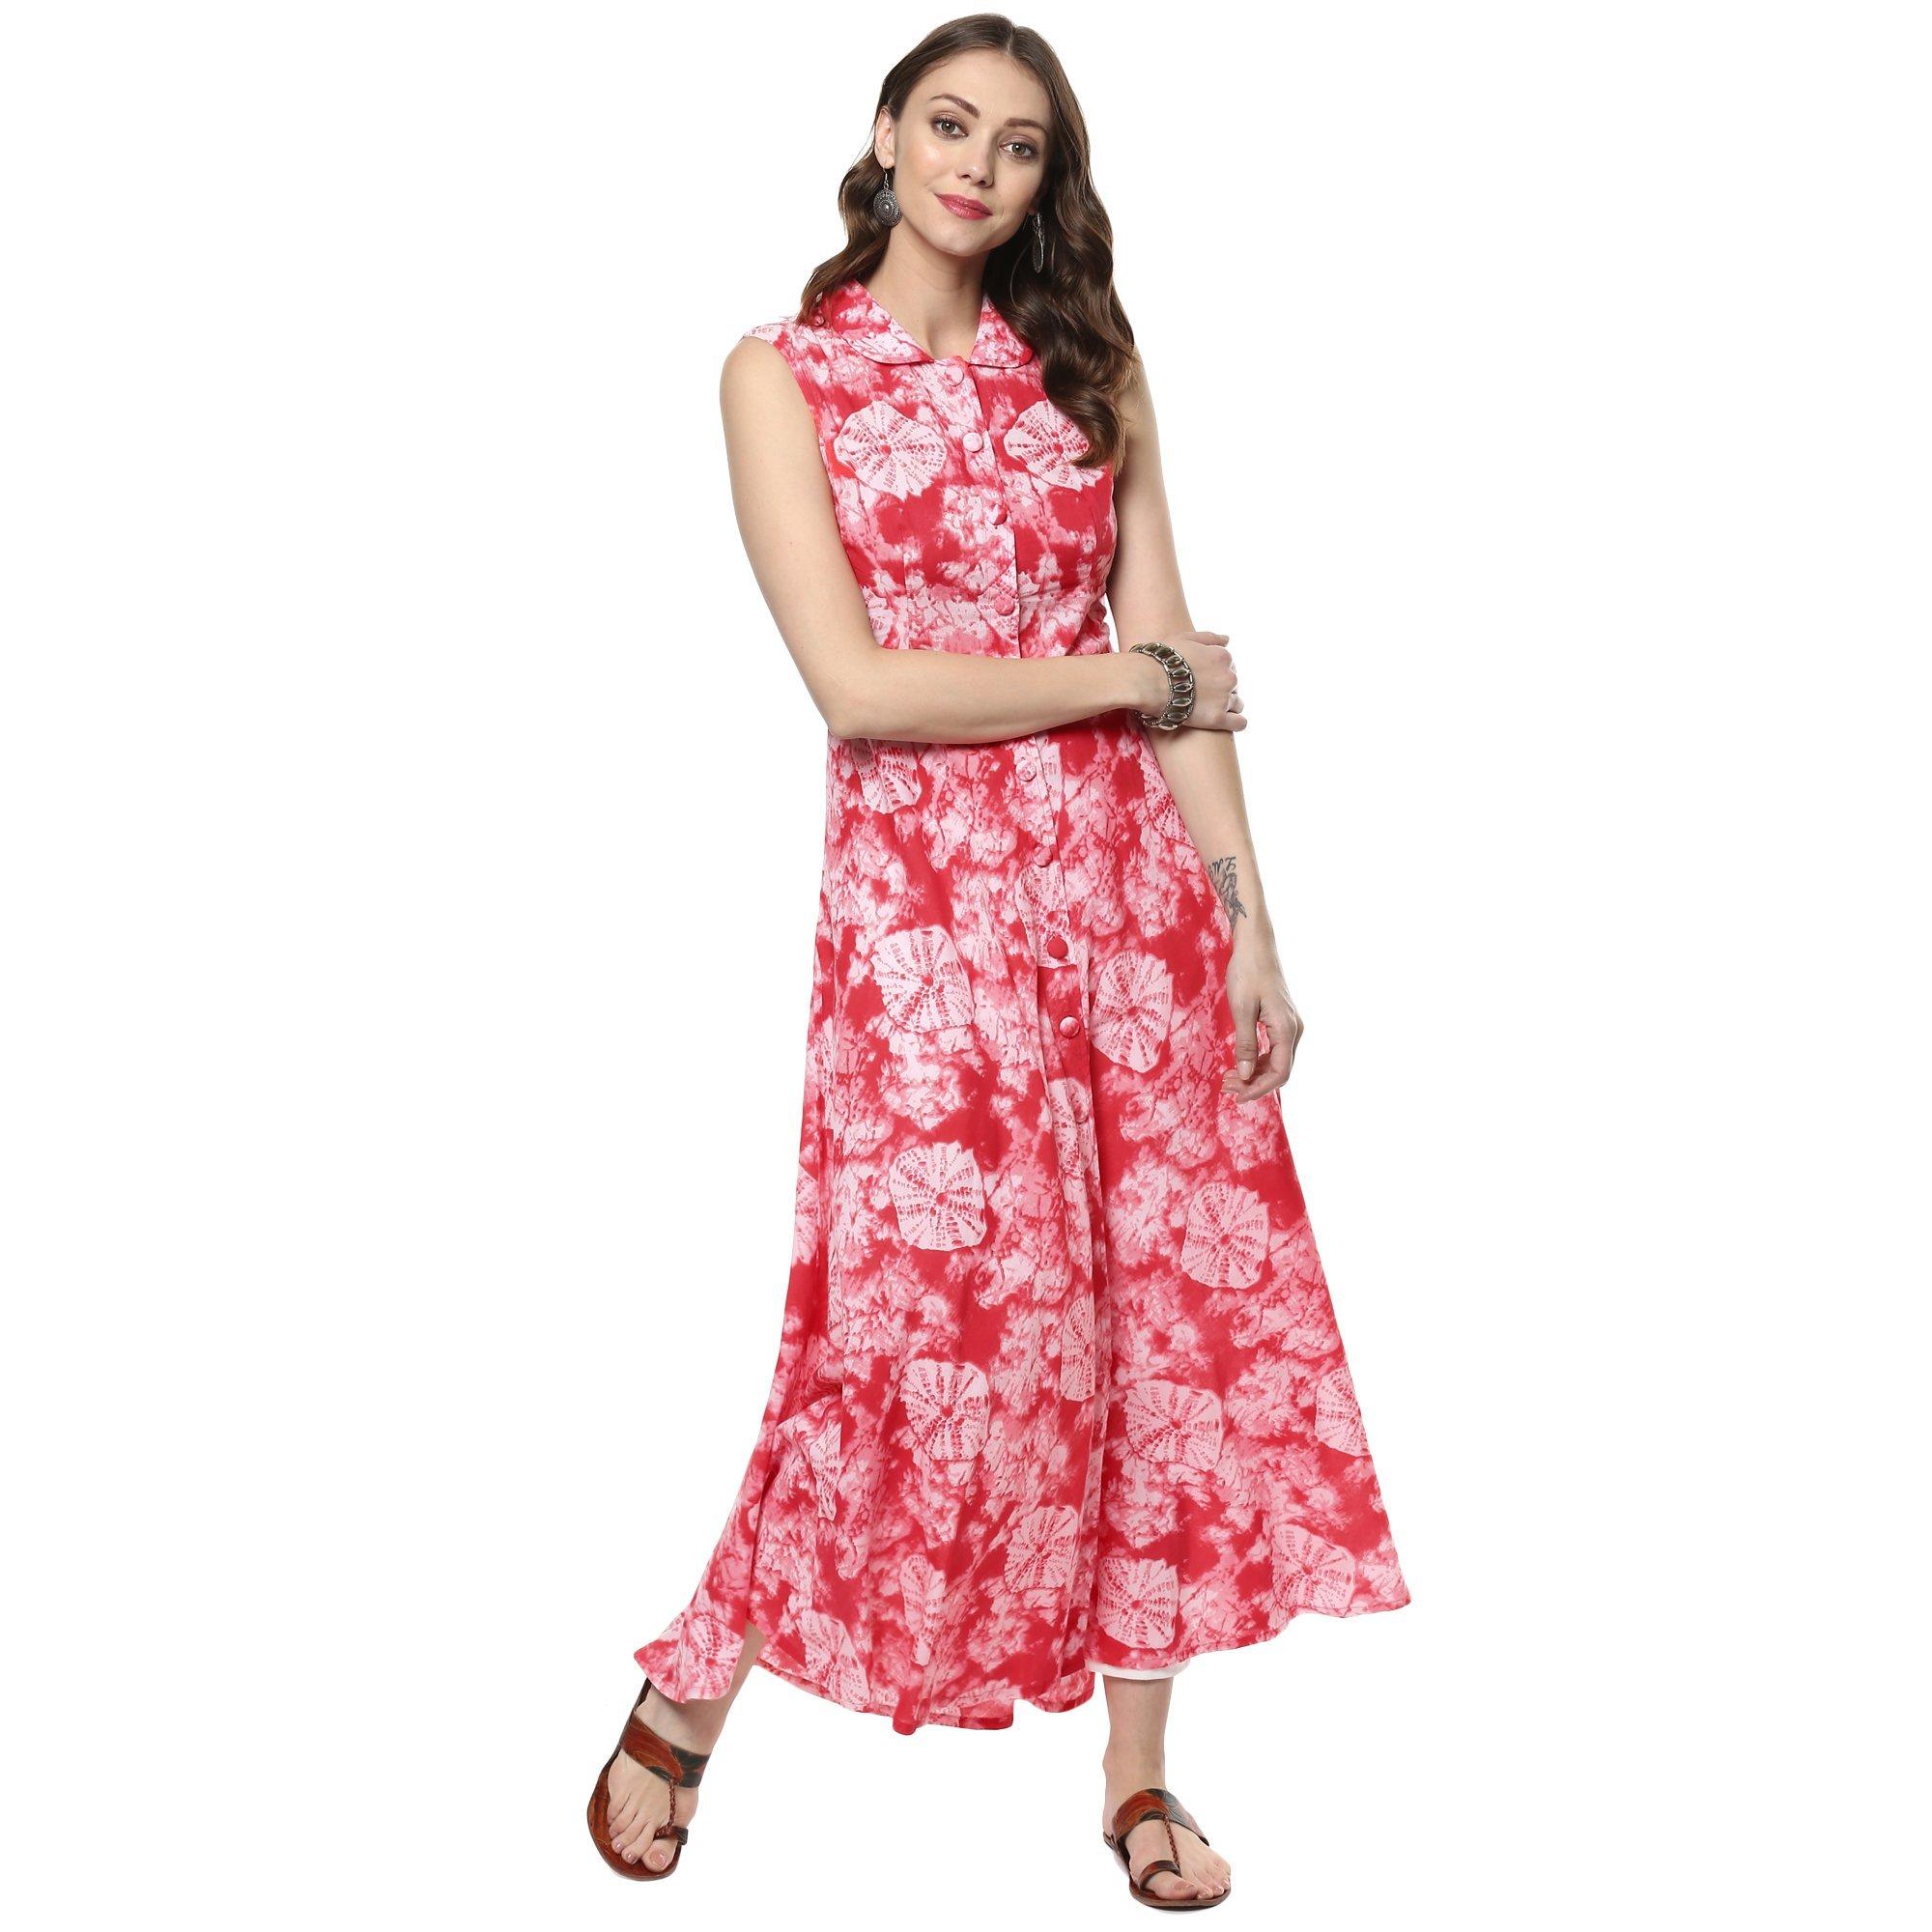 Indian Virasat Women's Printed Cotton Front Slit A-Line Kurta Large Red Tunic Kurti